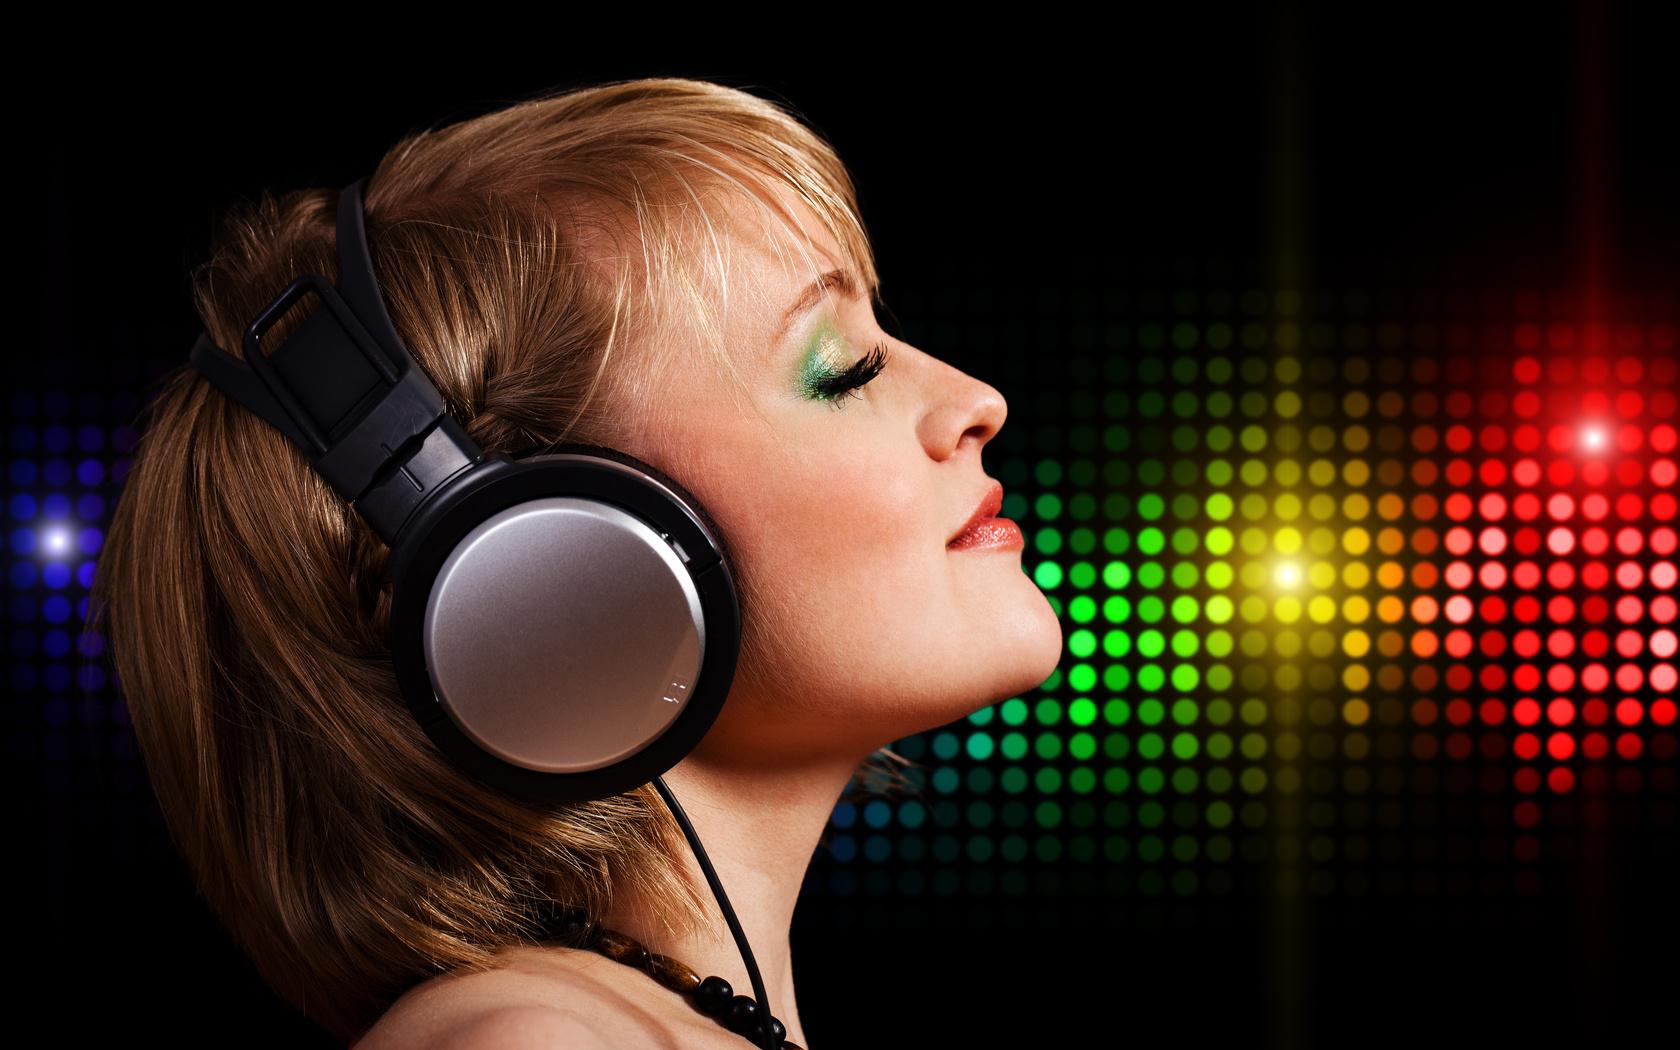 Ver Video Musical Crazy Little Party Girl - fusavideoscom